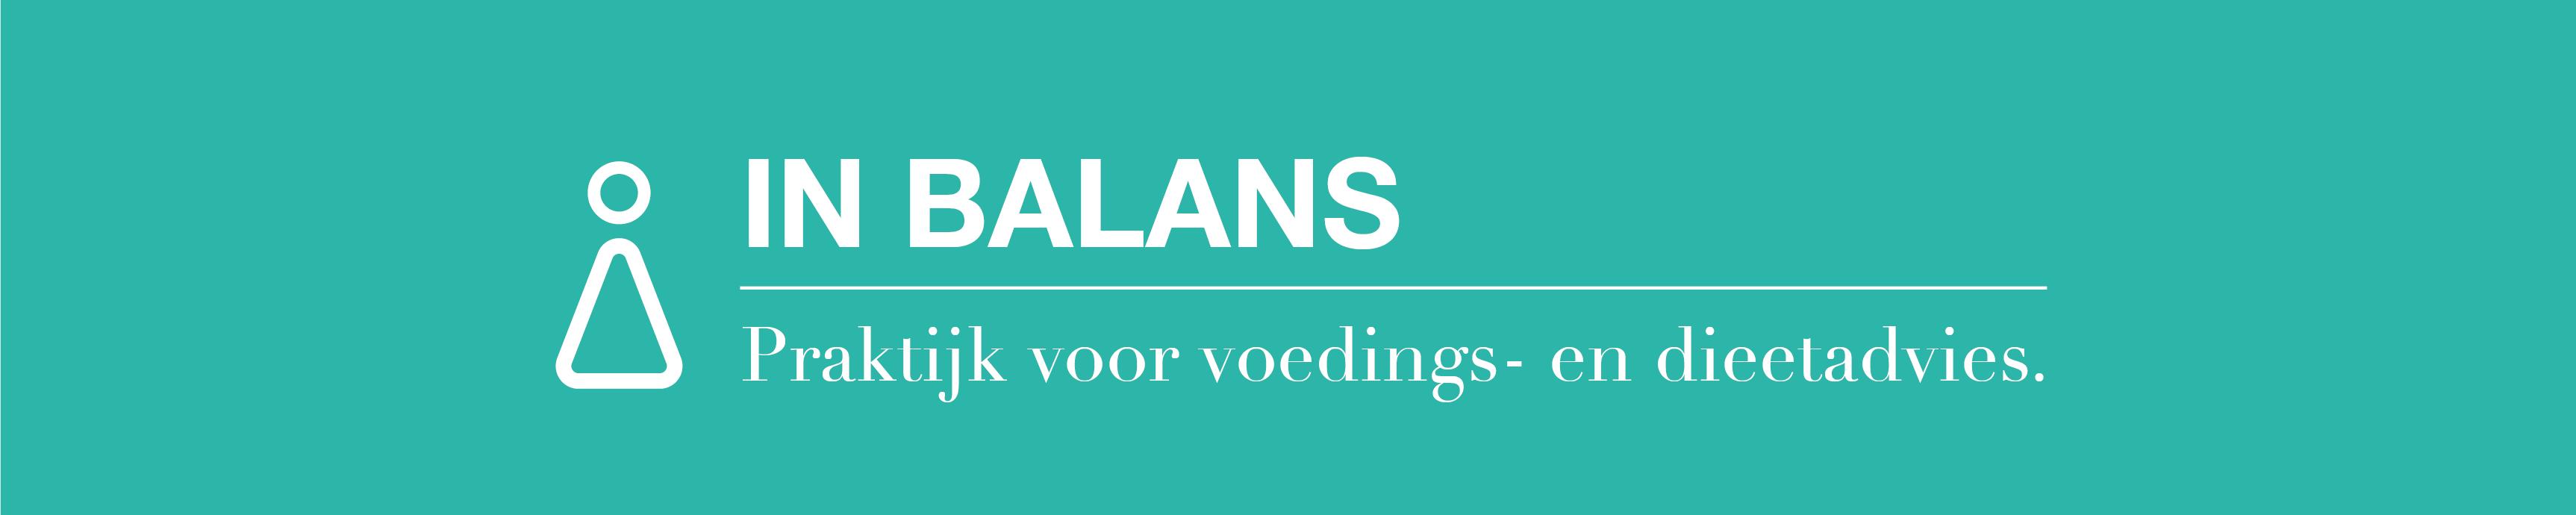 In Balans, praktijk voor voedings- en dieetadvies